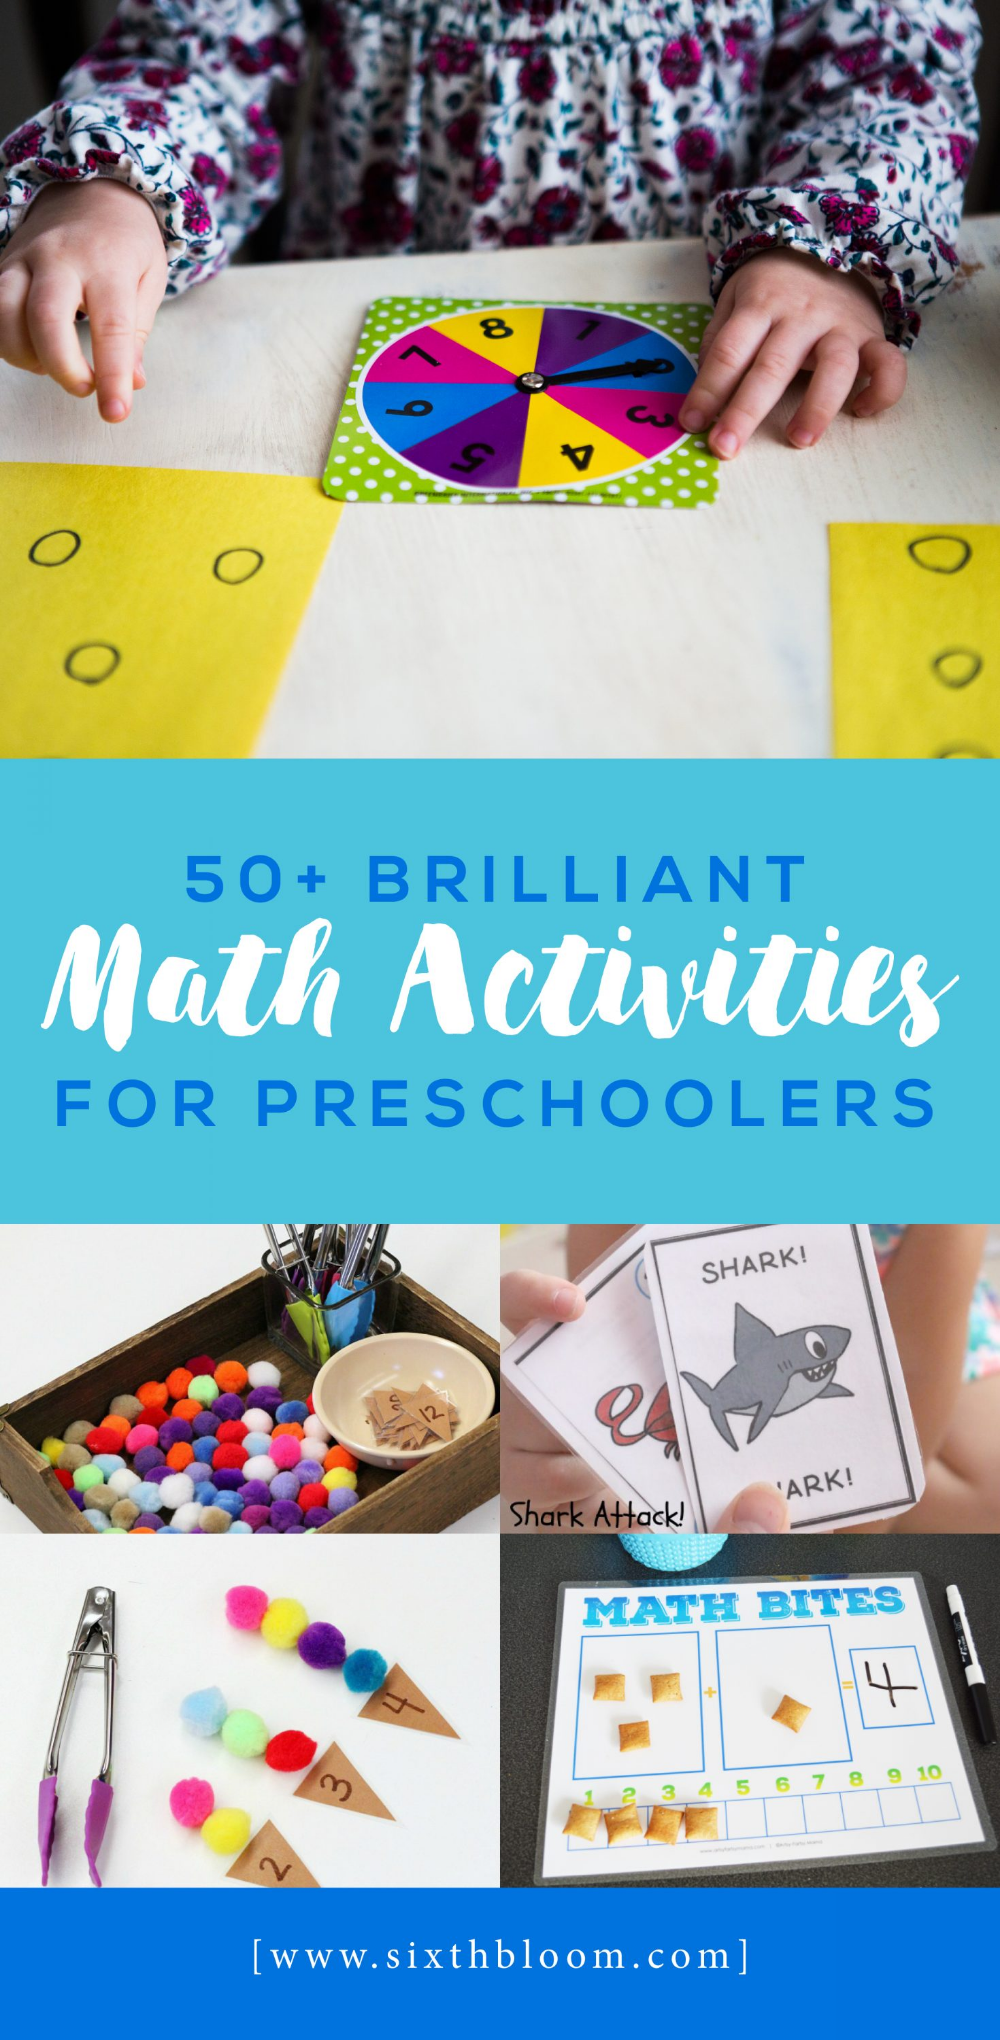 50+ Brilliant Math Activities for Preschoolers Problem